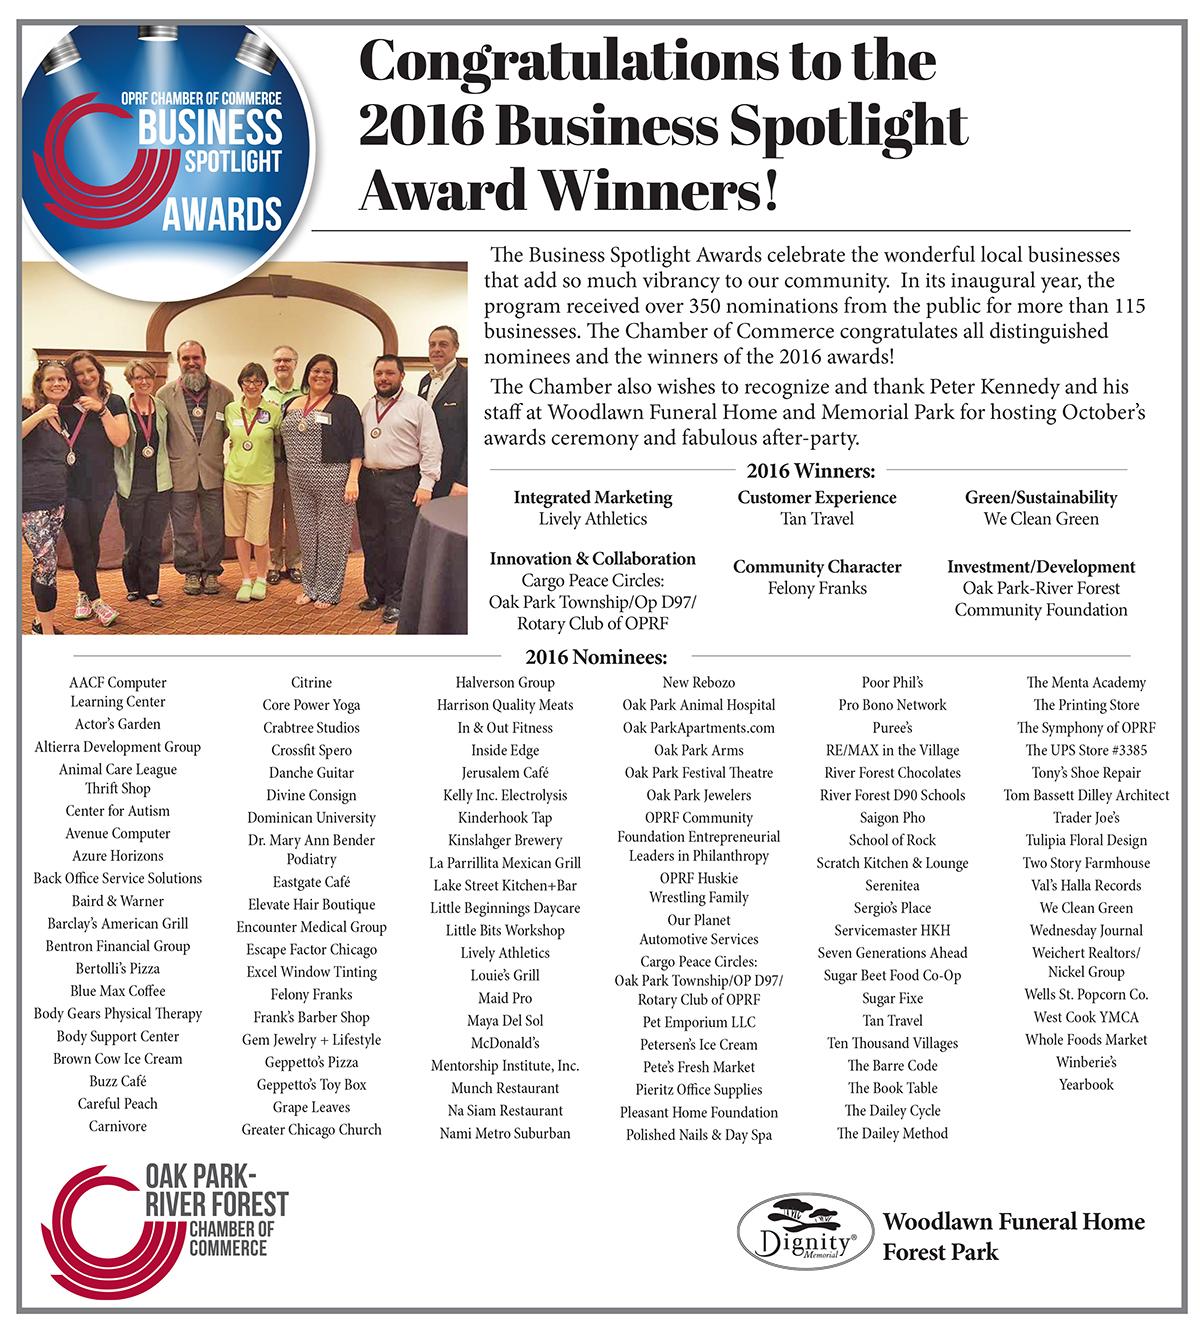 Oak park river forest Chamber_Spotlight Awards Wednesday Journal Ad Woodlawn